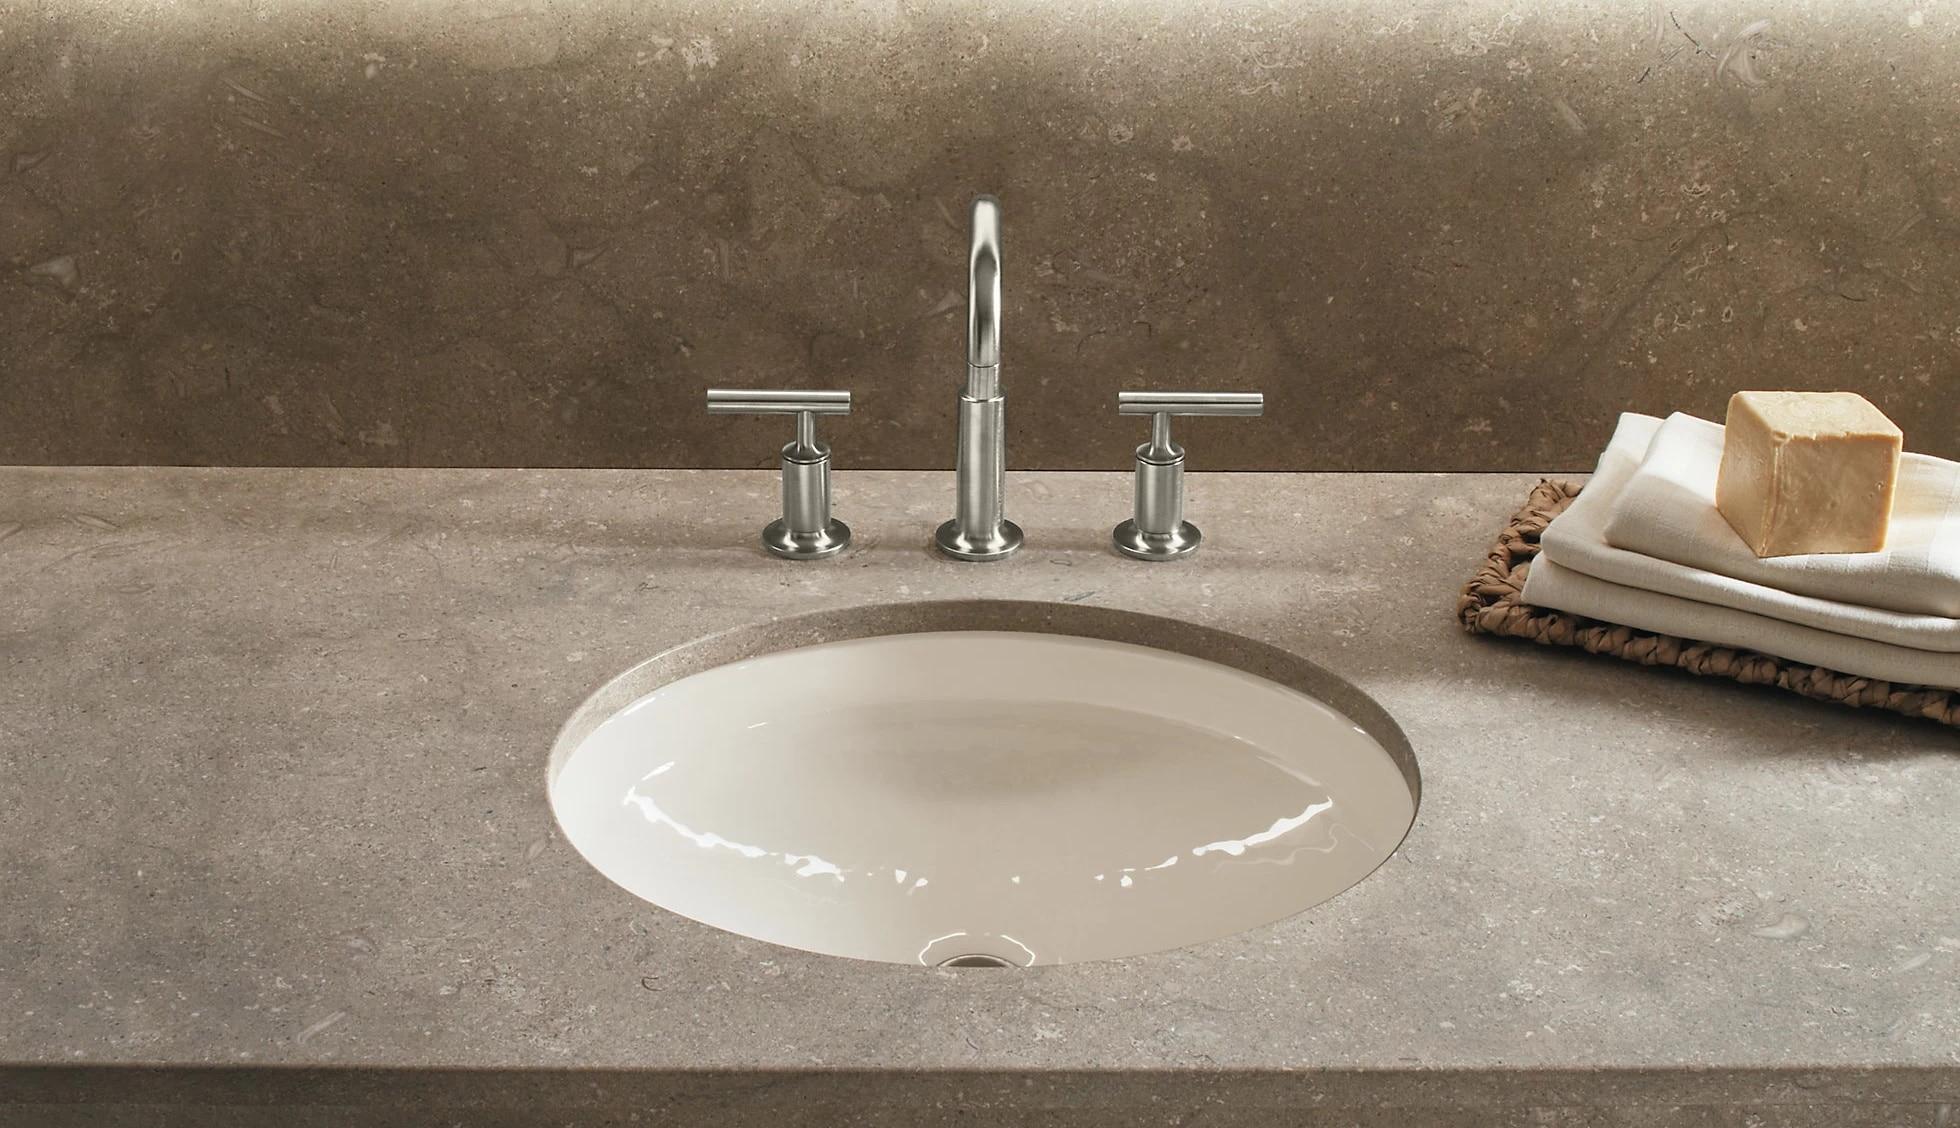 6 best undermount bathroom sinks may